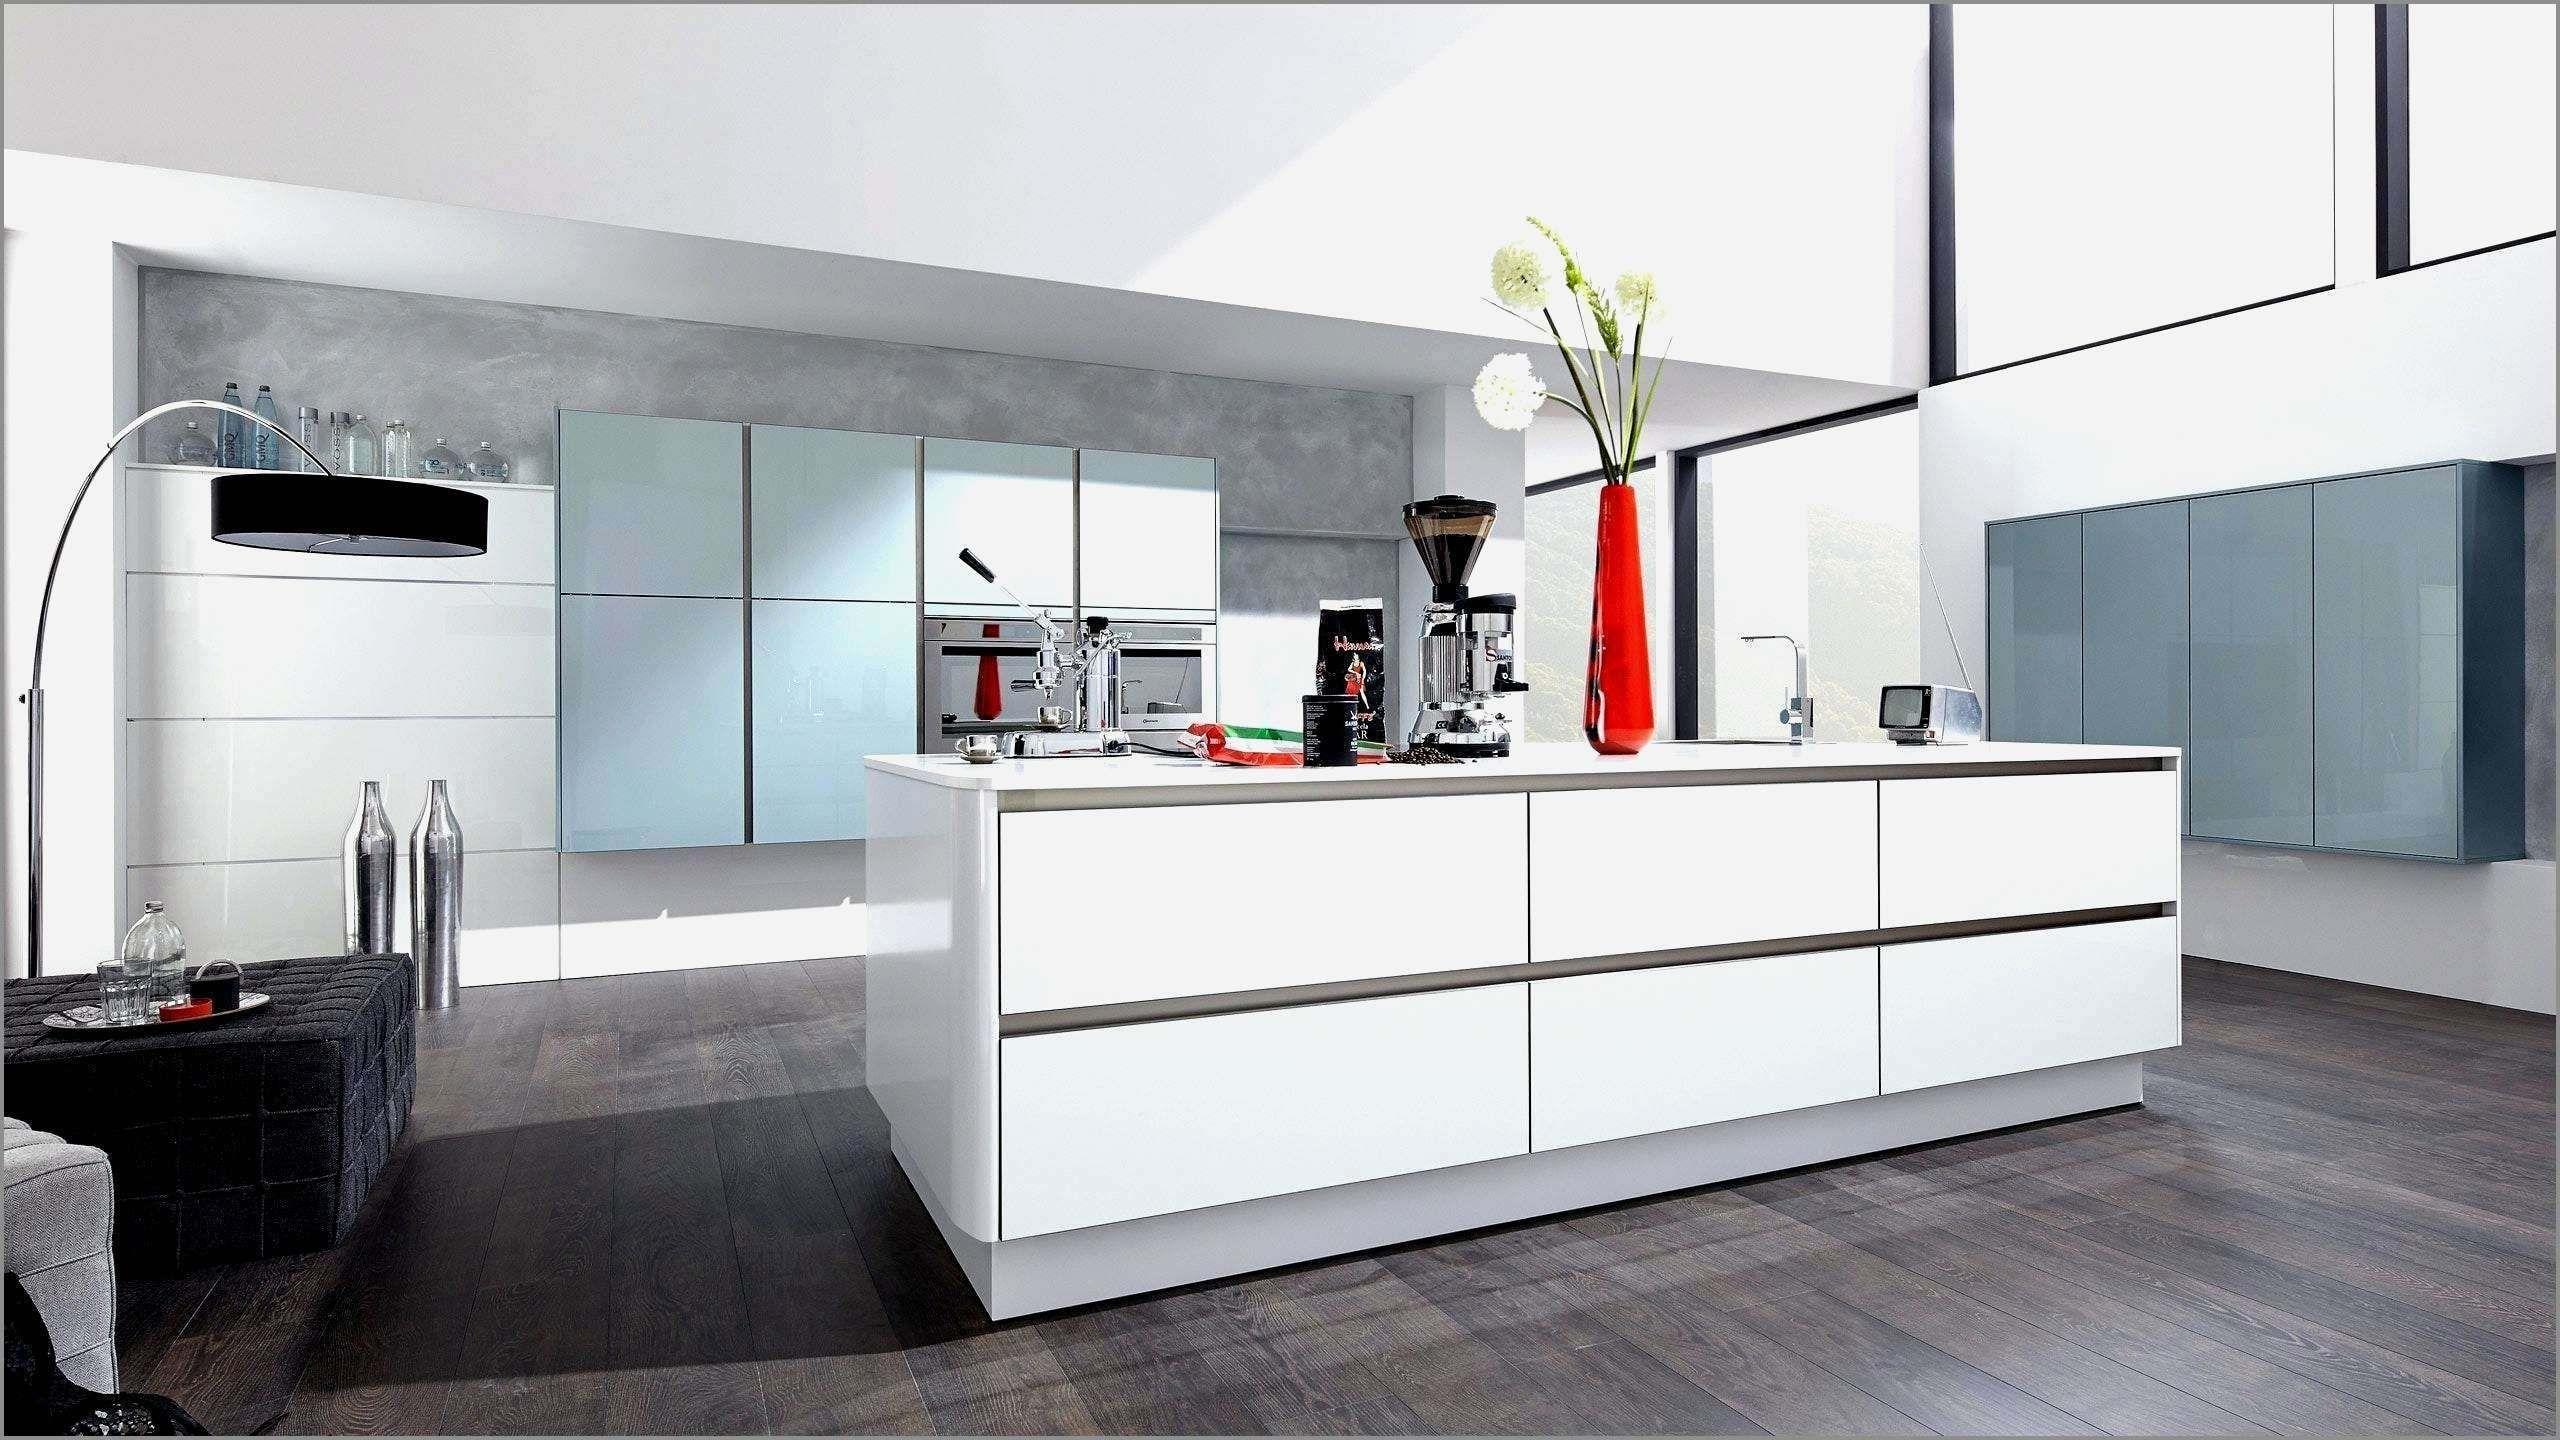 45 Neu Kuche Keramik Arbeitsplatte Preis Kitchen Kitchen Handleless Kitchen Minimalist Kitchen